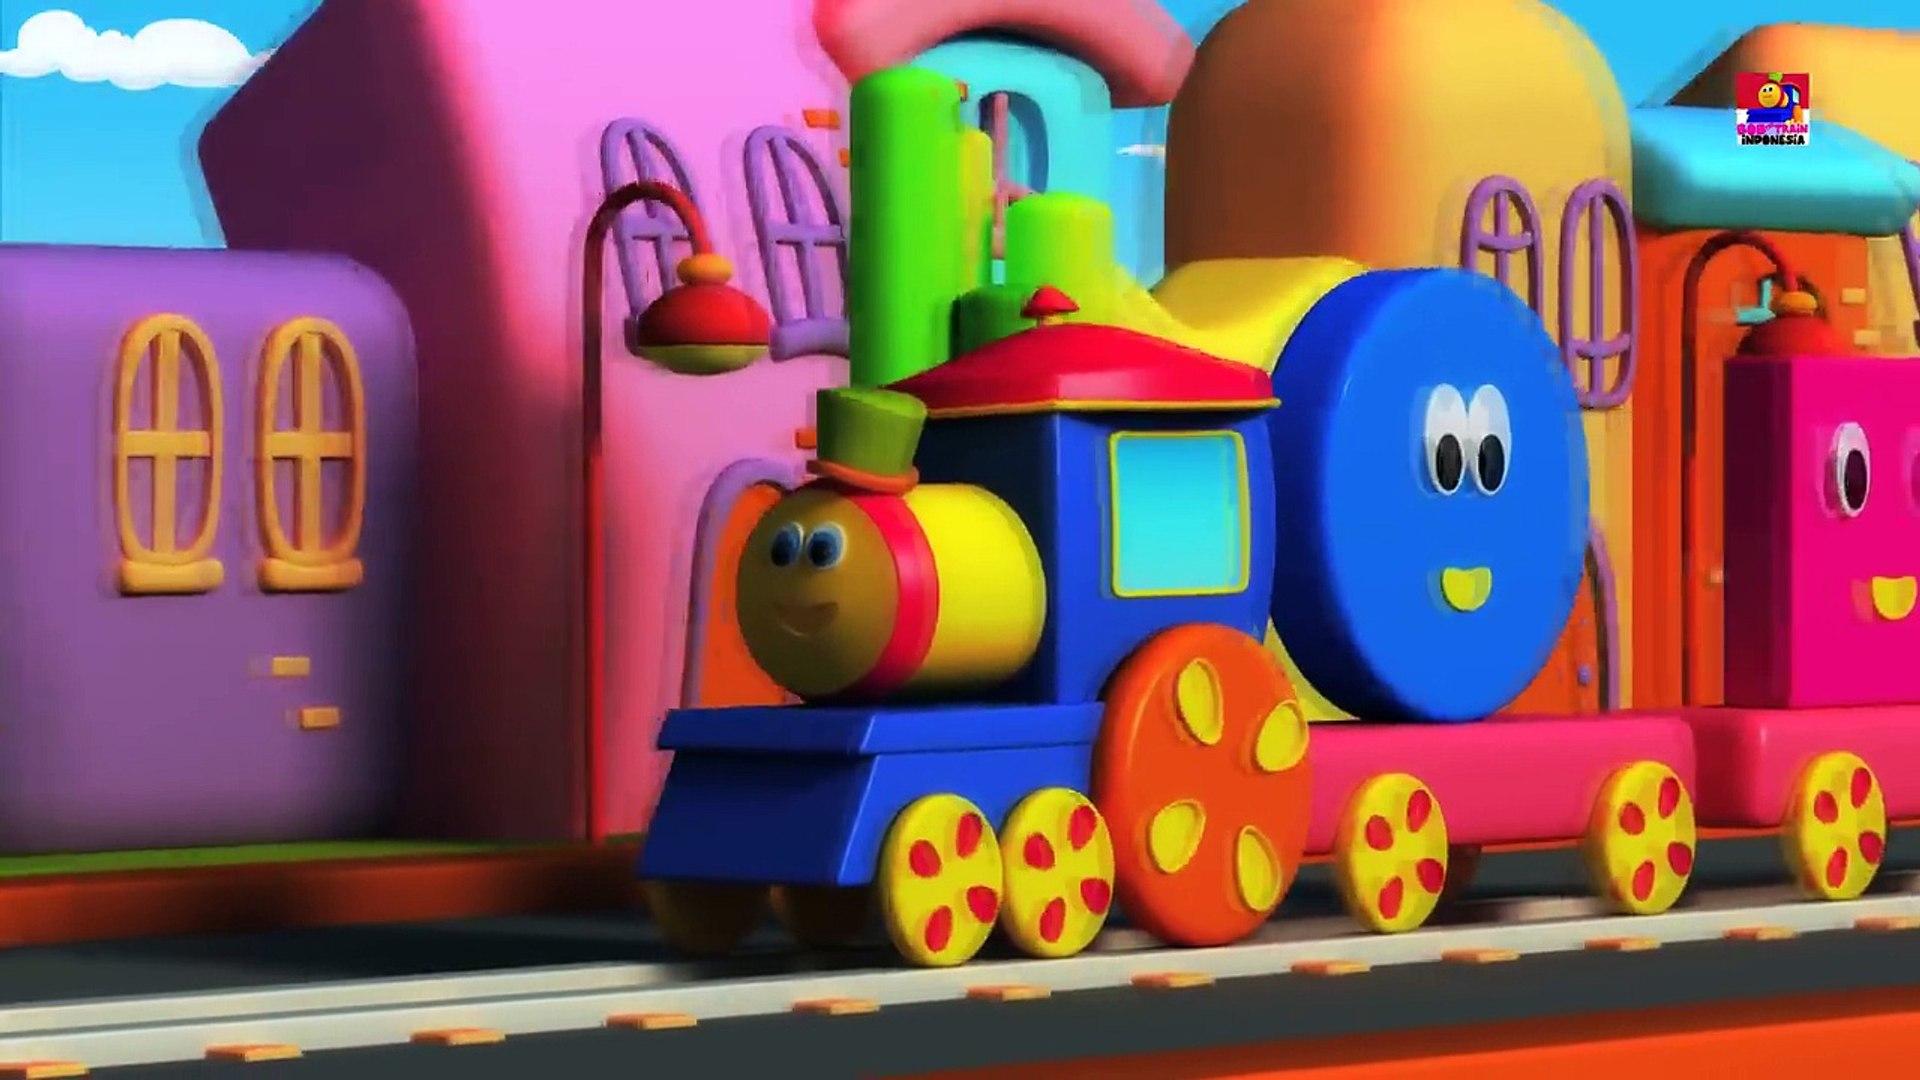 Bob Kereta Bentuknya Lagu Belajar Bentuknya Video Anak Anak Bob Train